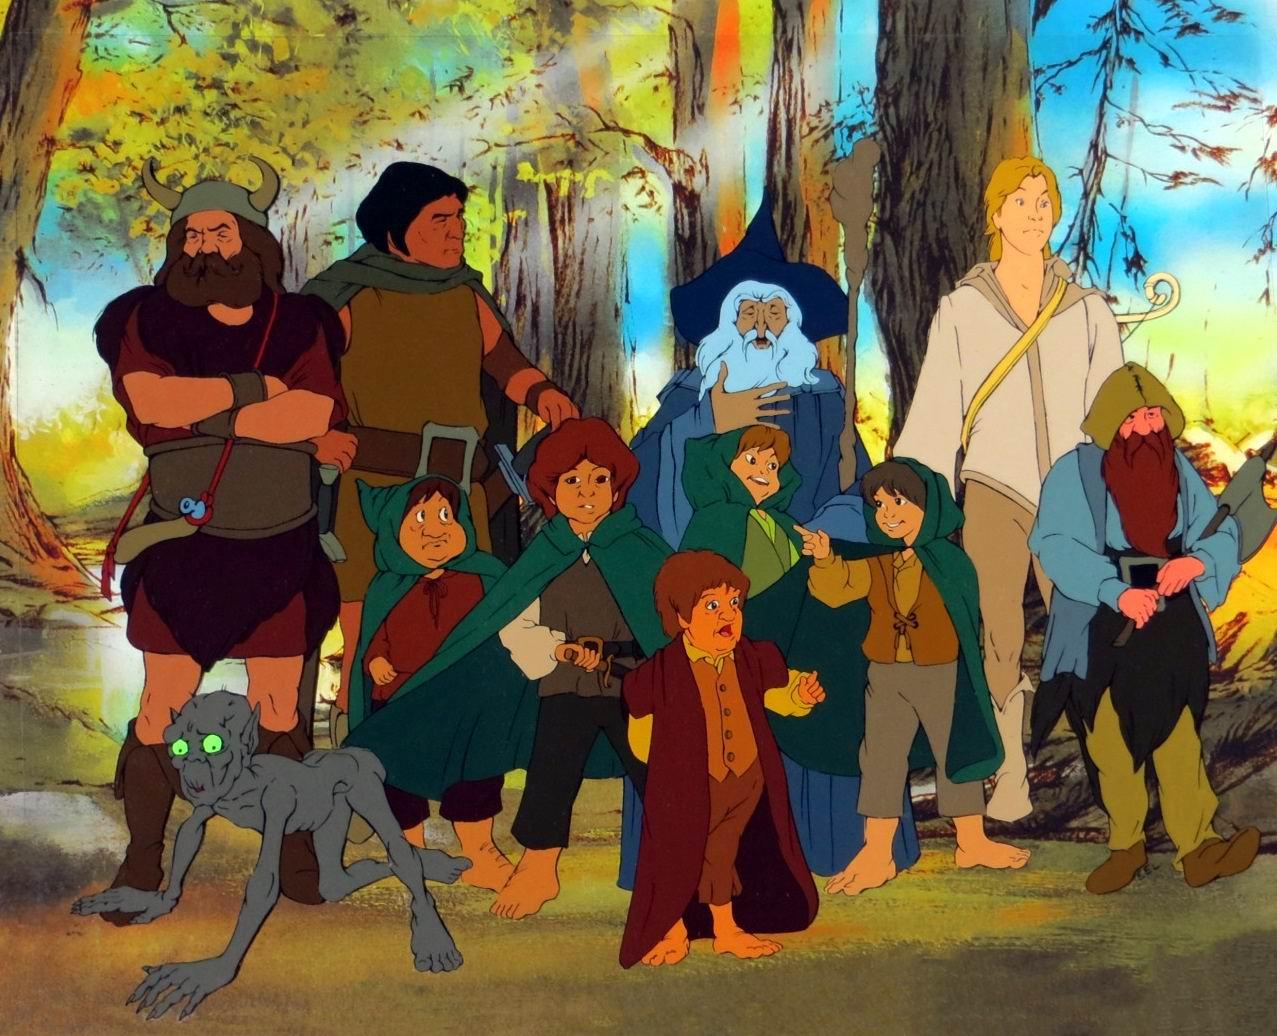 Властелин колец / The Lord of the Rings / El señor de los anillos (1978): кадр из фильма